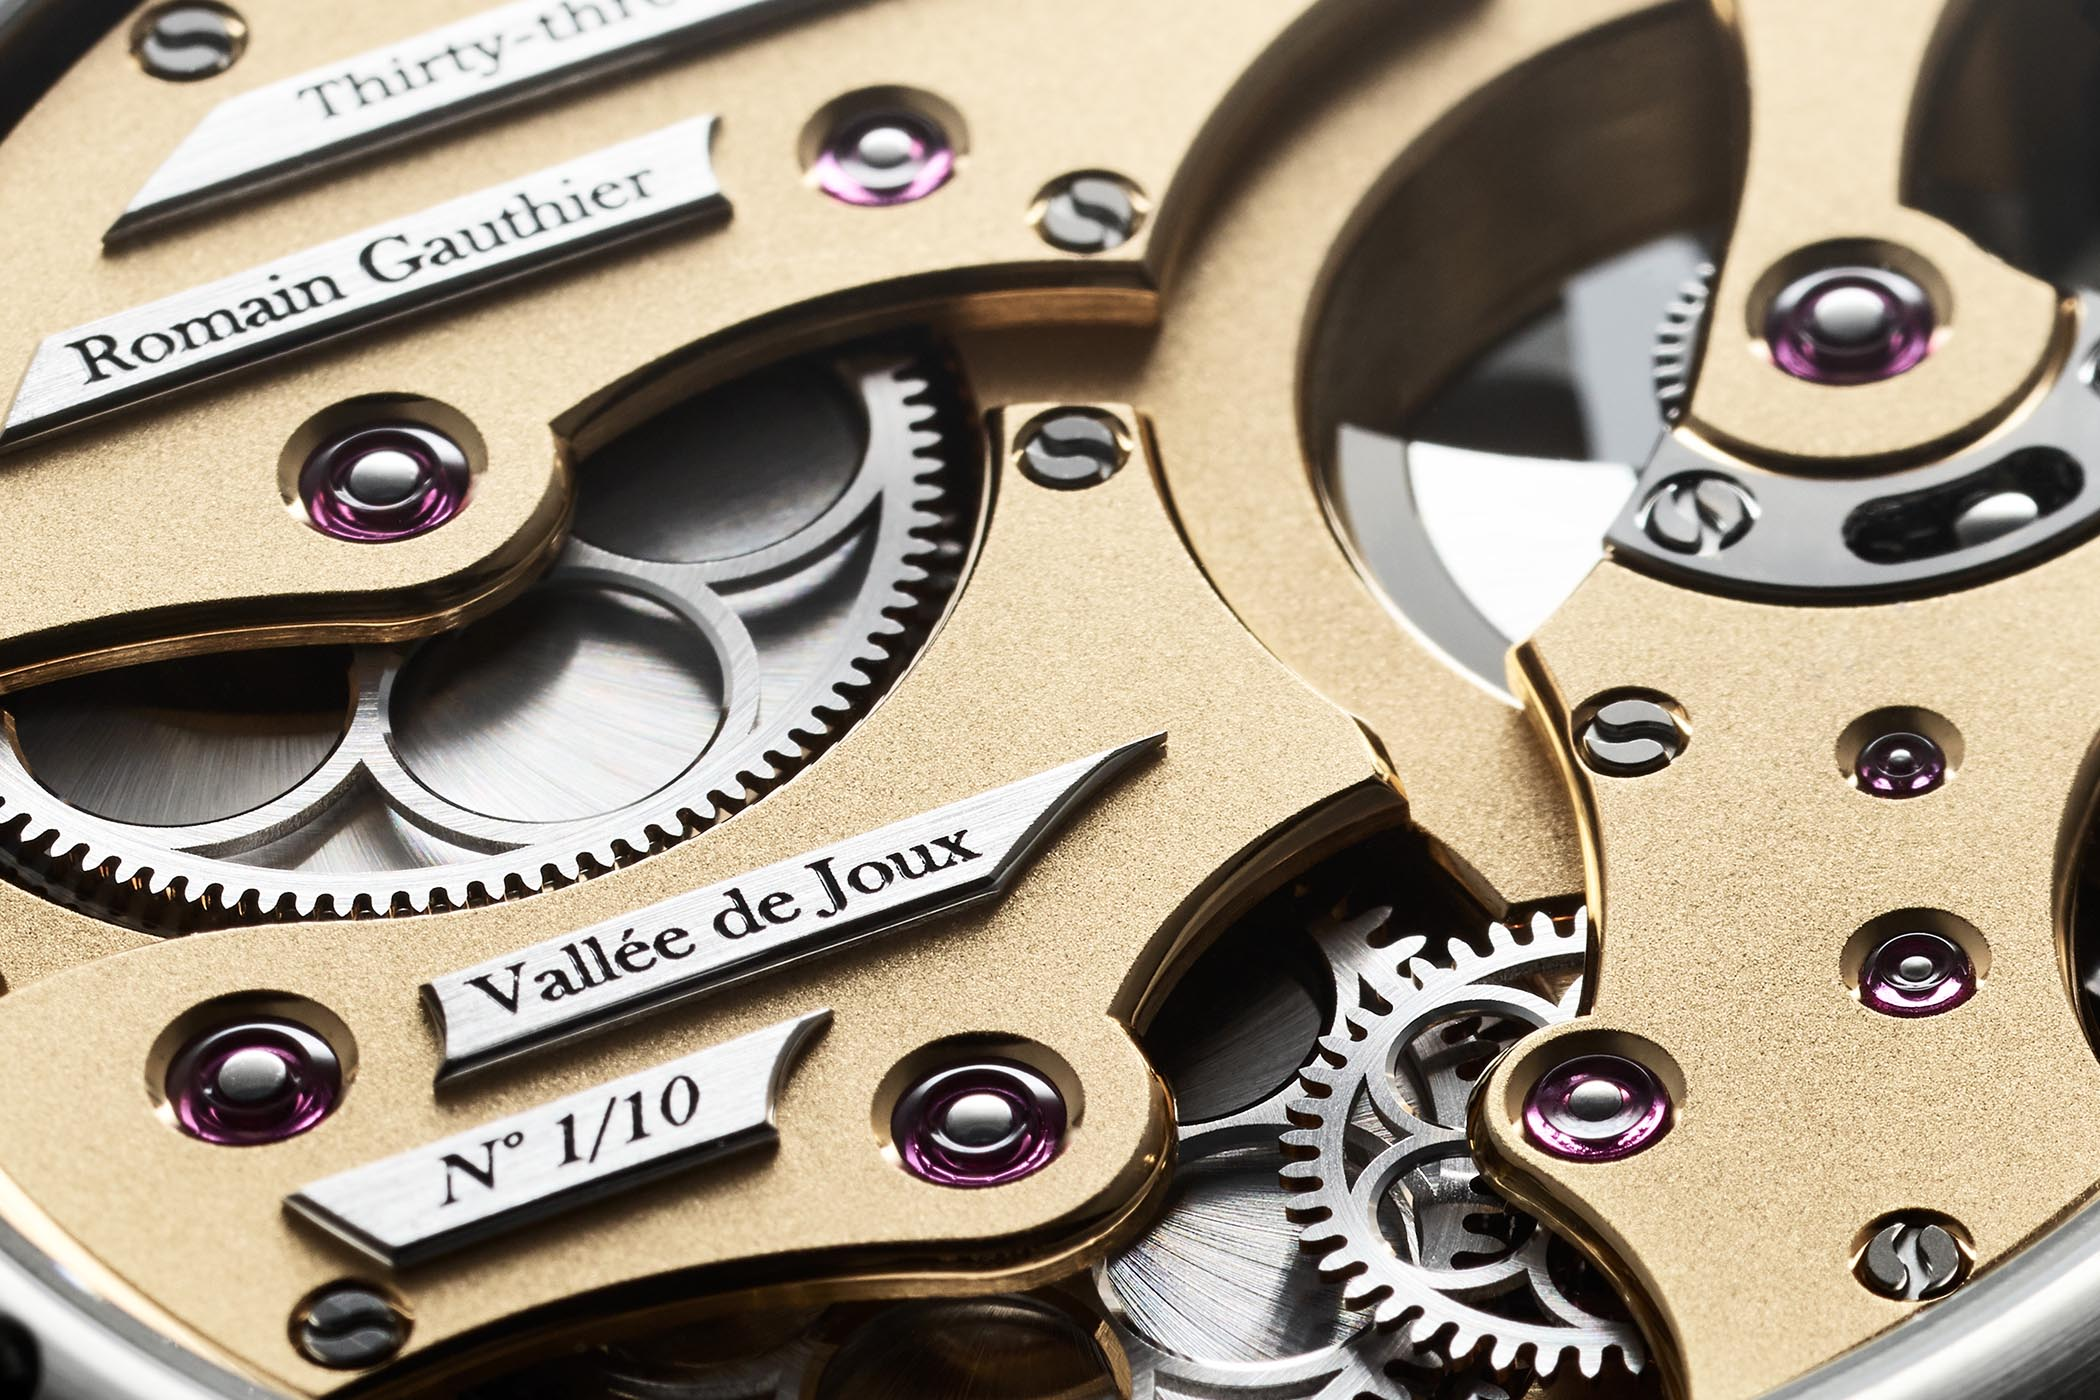 Romain Gauthier Insight Micro-Rotor White Gold - 8